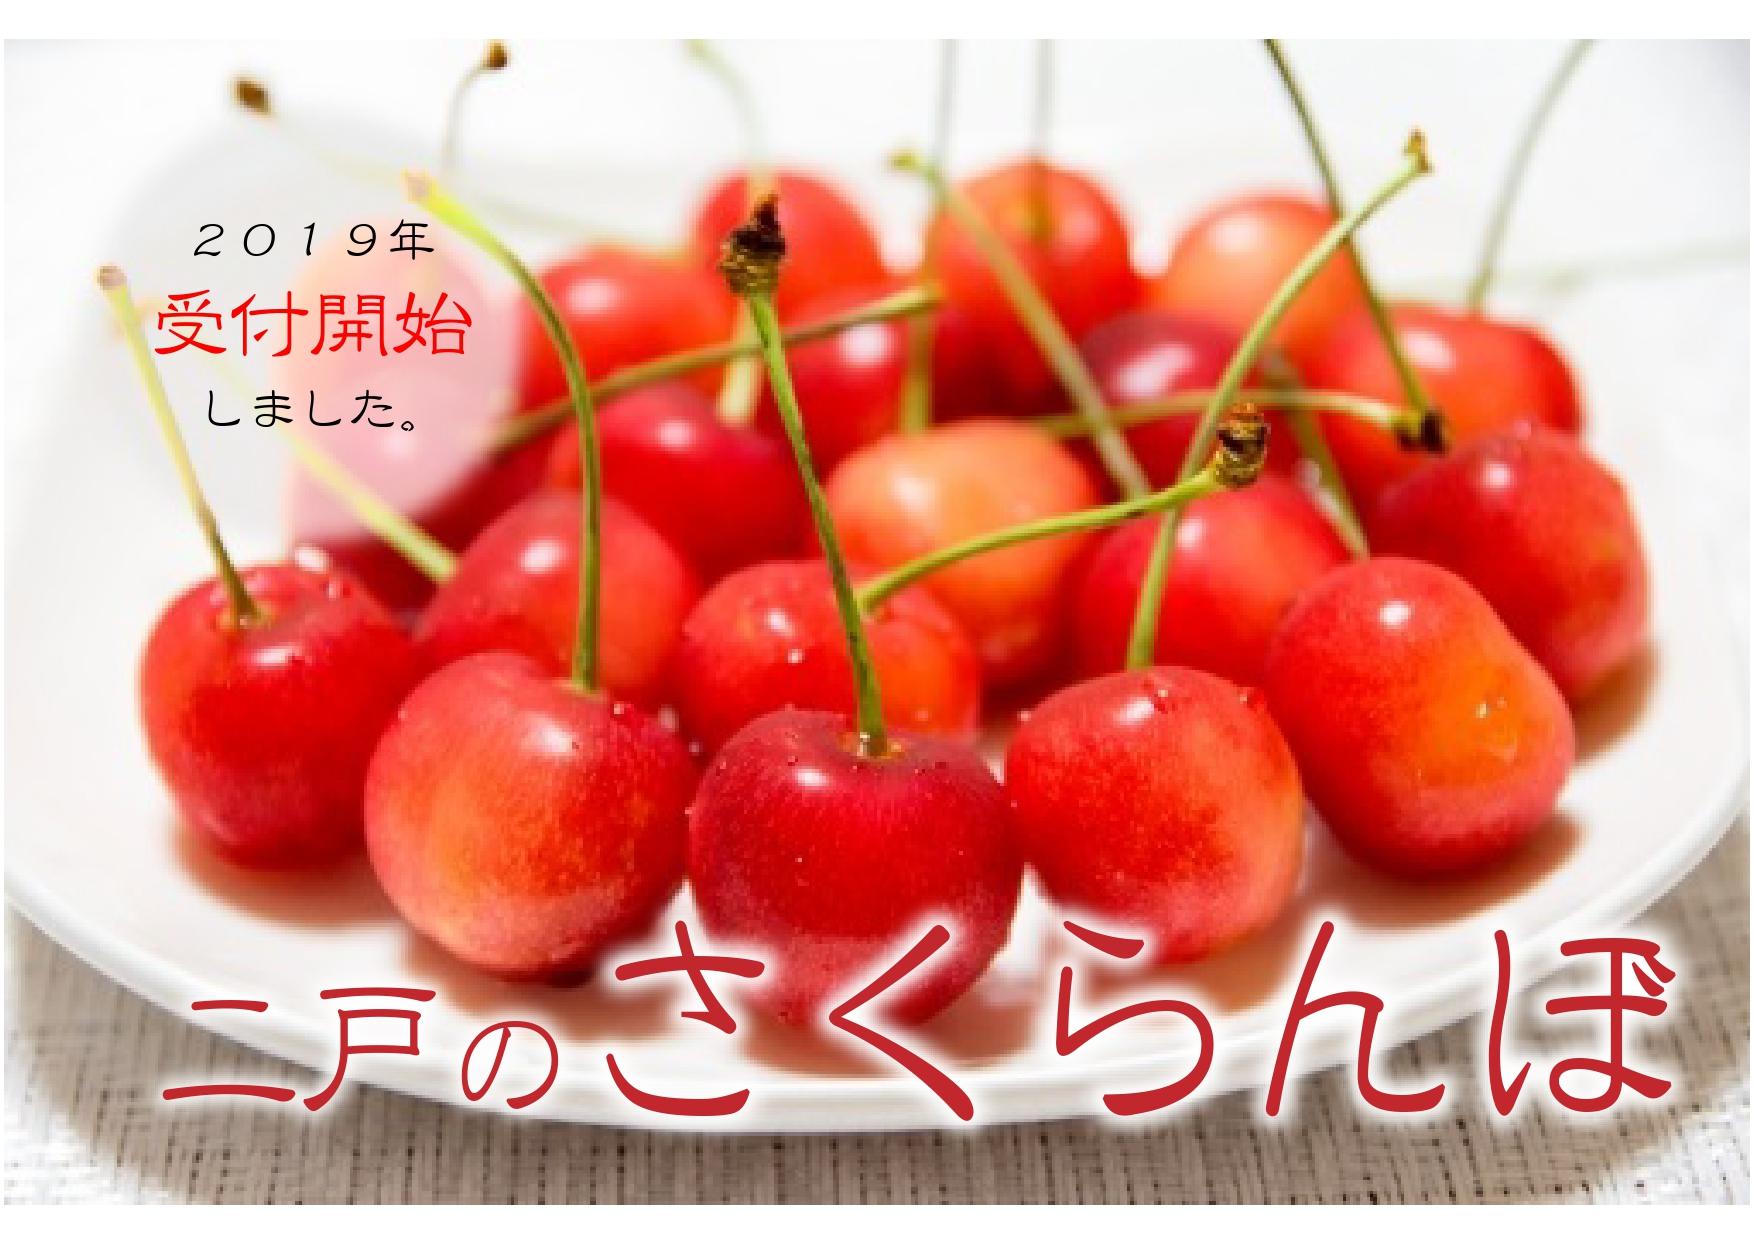 staff_1527471287_img2.jpg